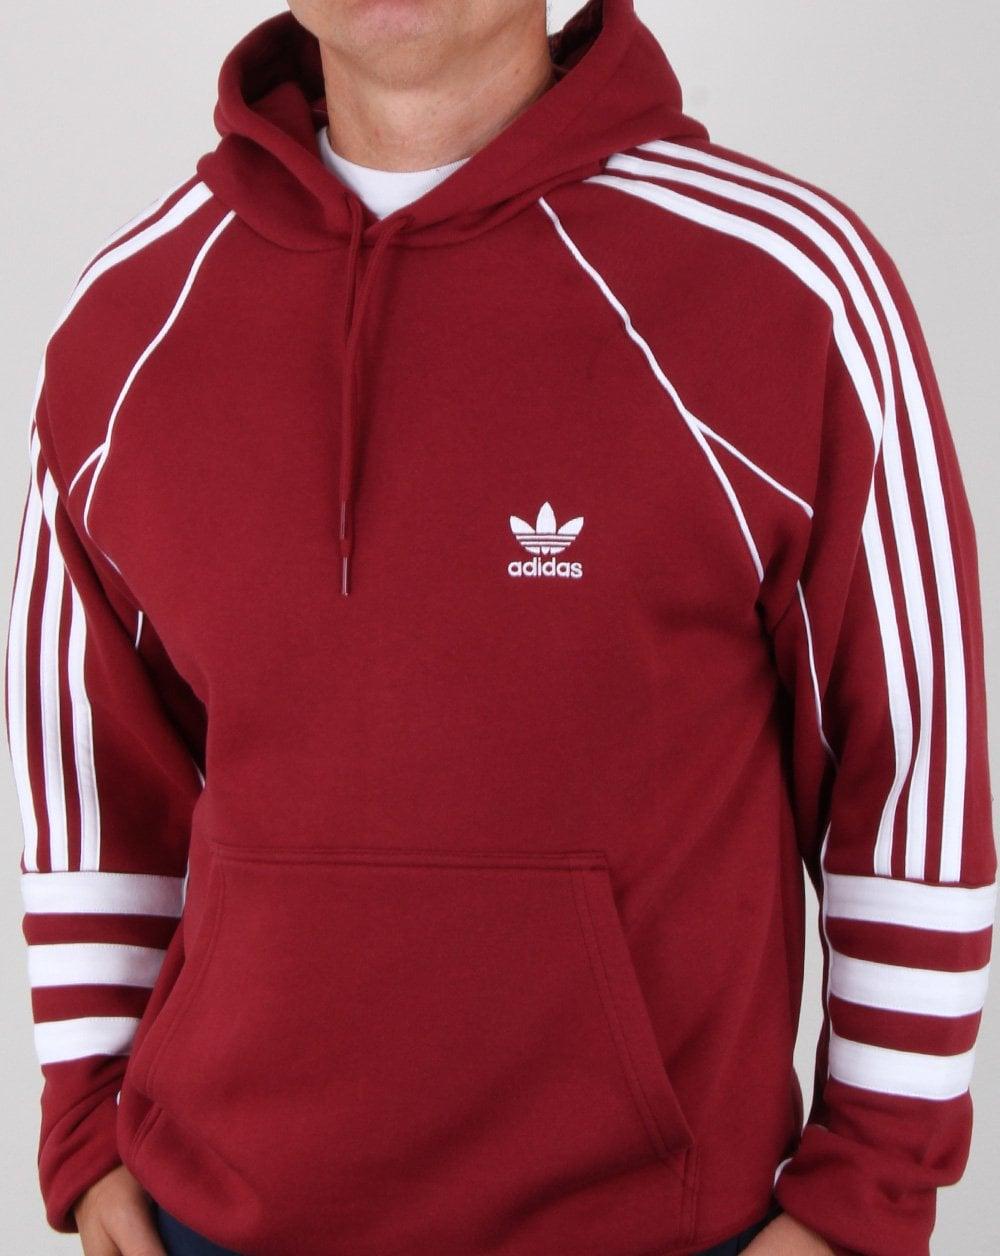 adidas Originals Adidas Originals Authentics Hoody Maroon 46f8cb6476e